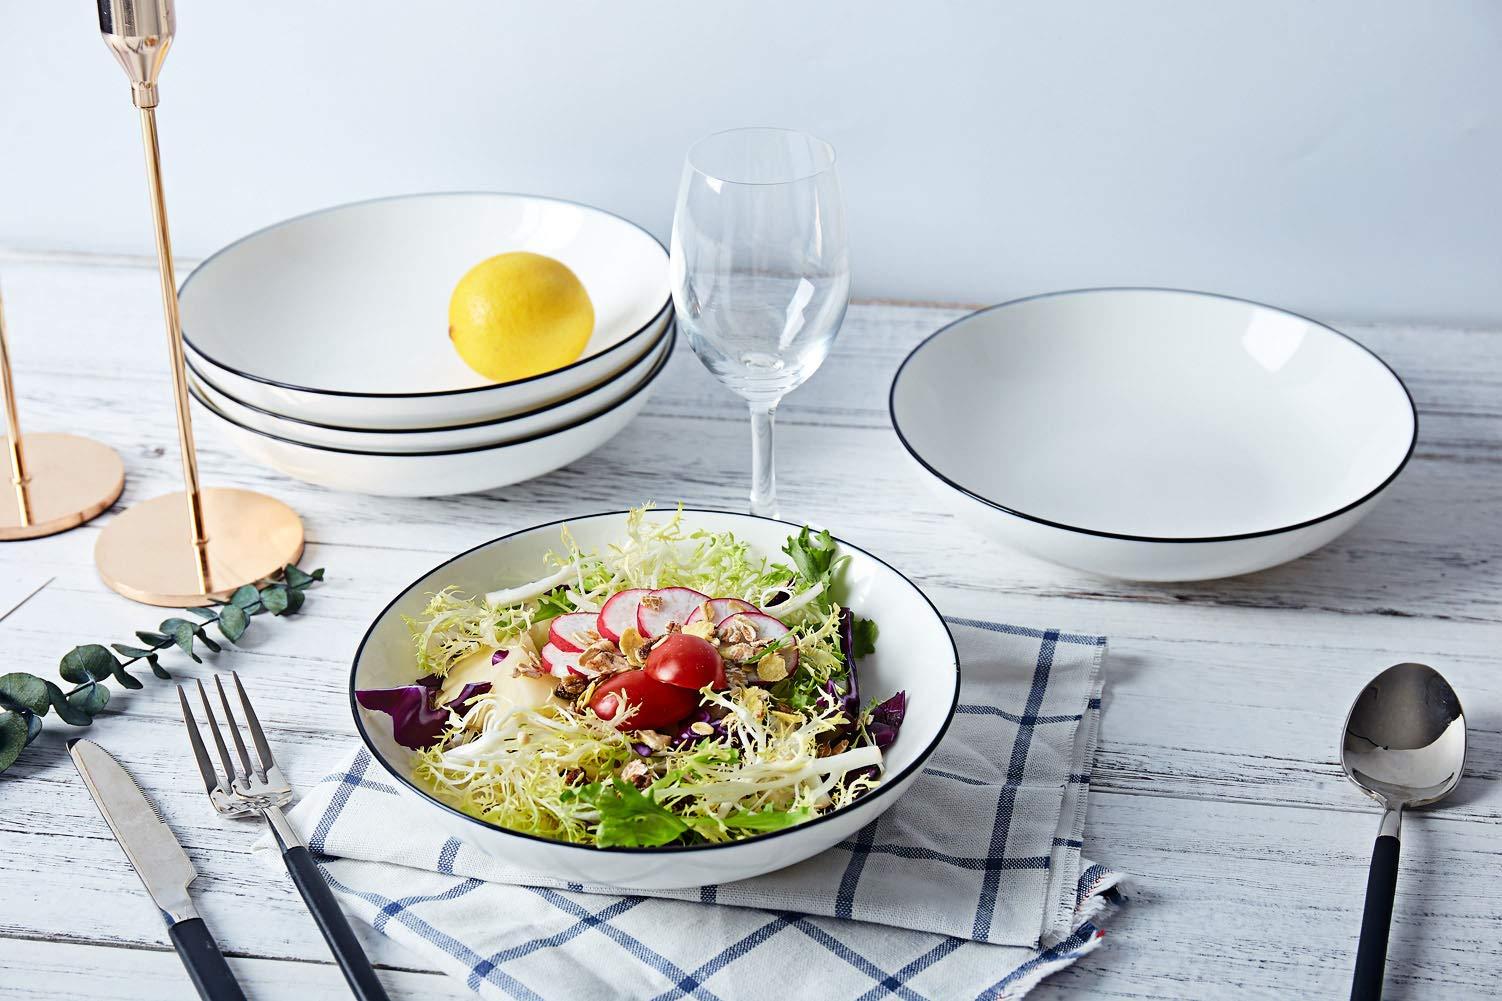 AnBnCn Porcelain Pasta/Salad Bowls - 25 Ounce - Set of 6, White by AnBnCn (Image #1)